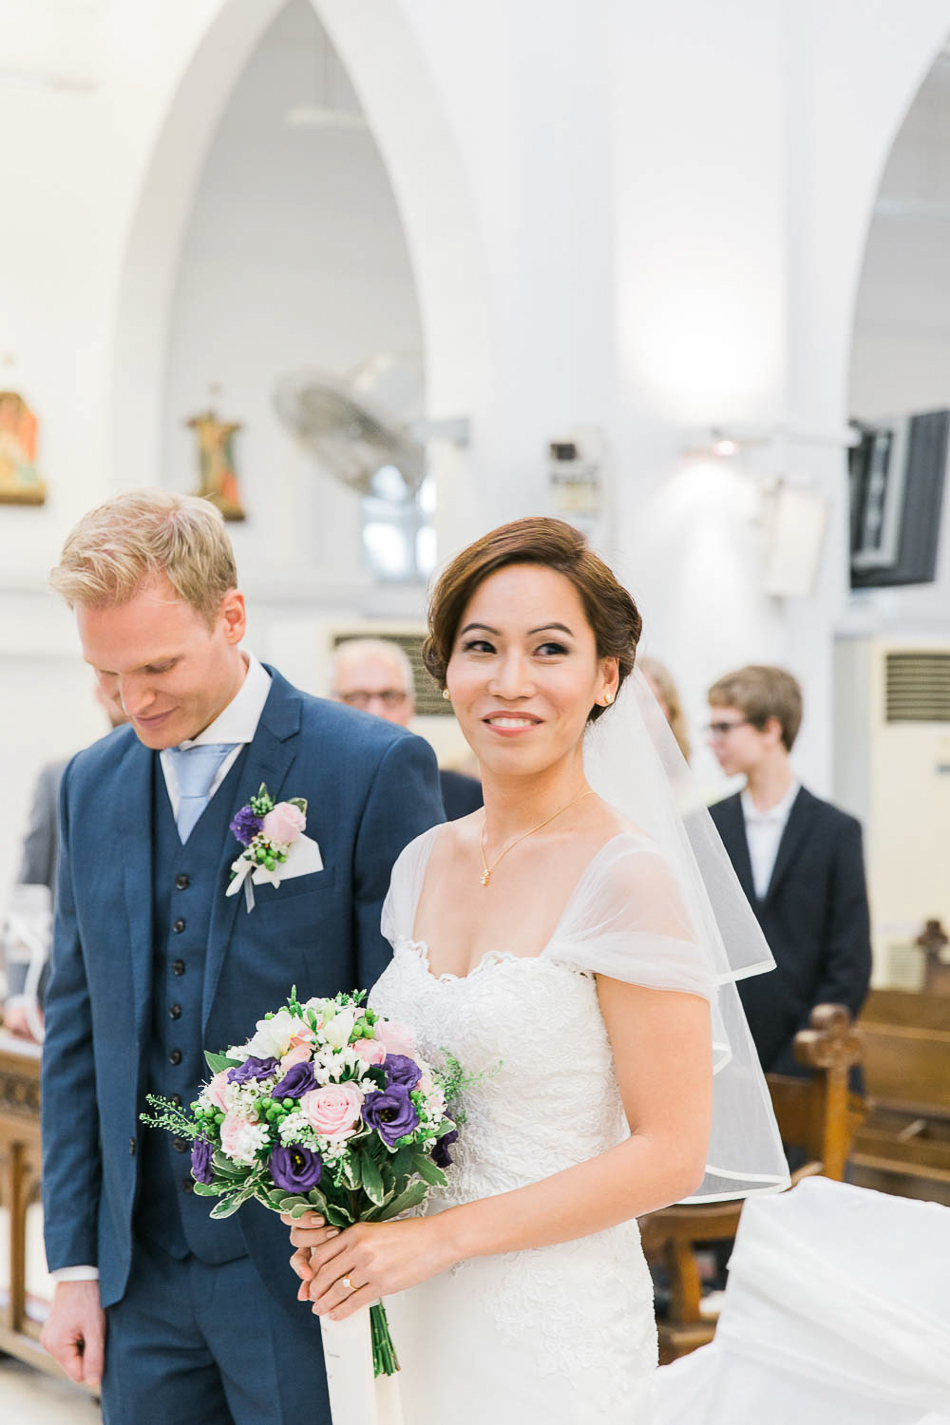 wedding-photographer-singapore-film-photographer-chen-sands-Anglea-wedding-CSPBLOG-10.jpg